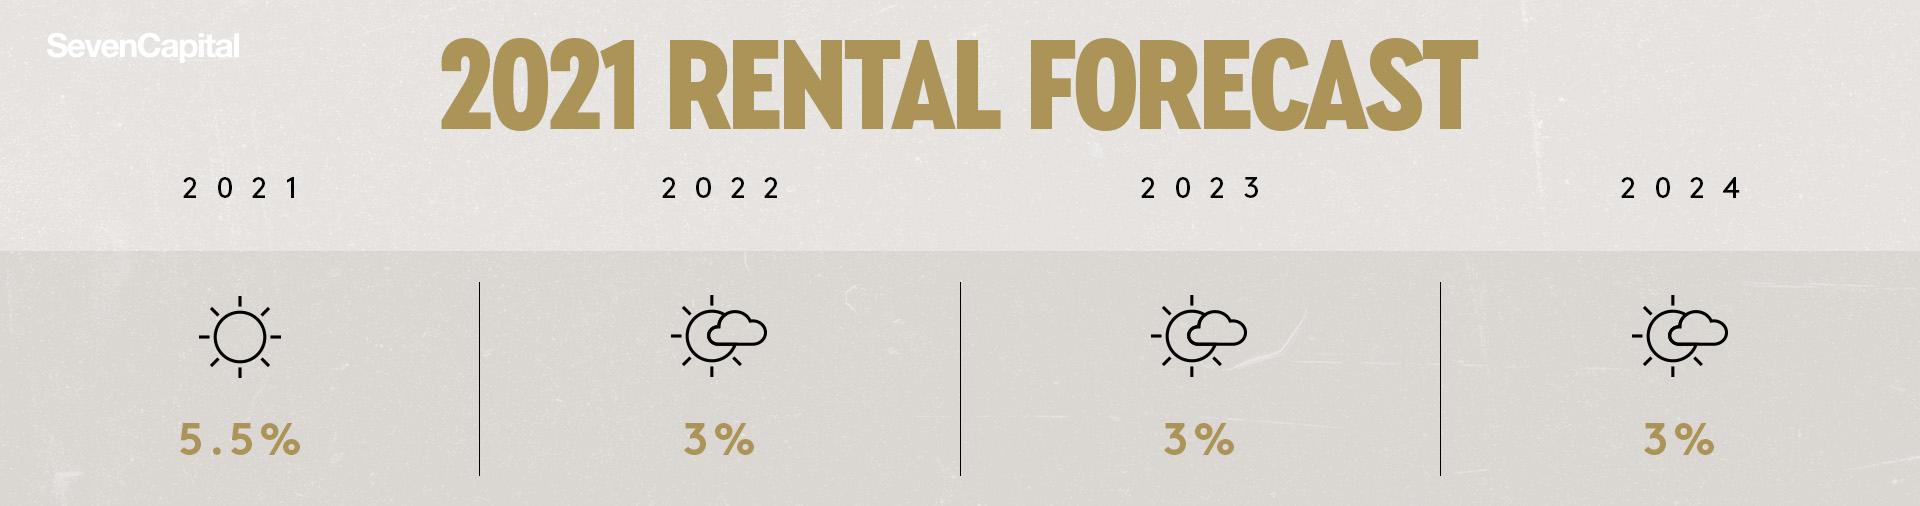 Rental Forecast 2021